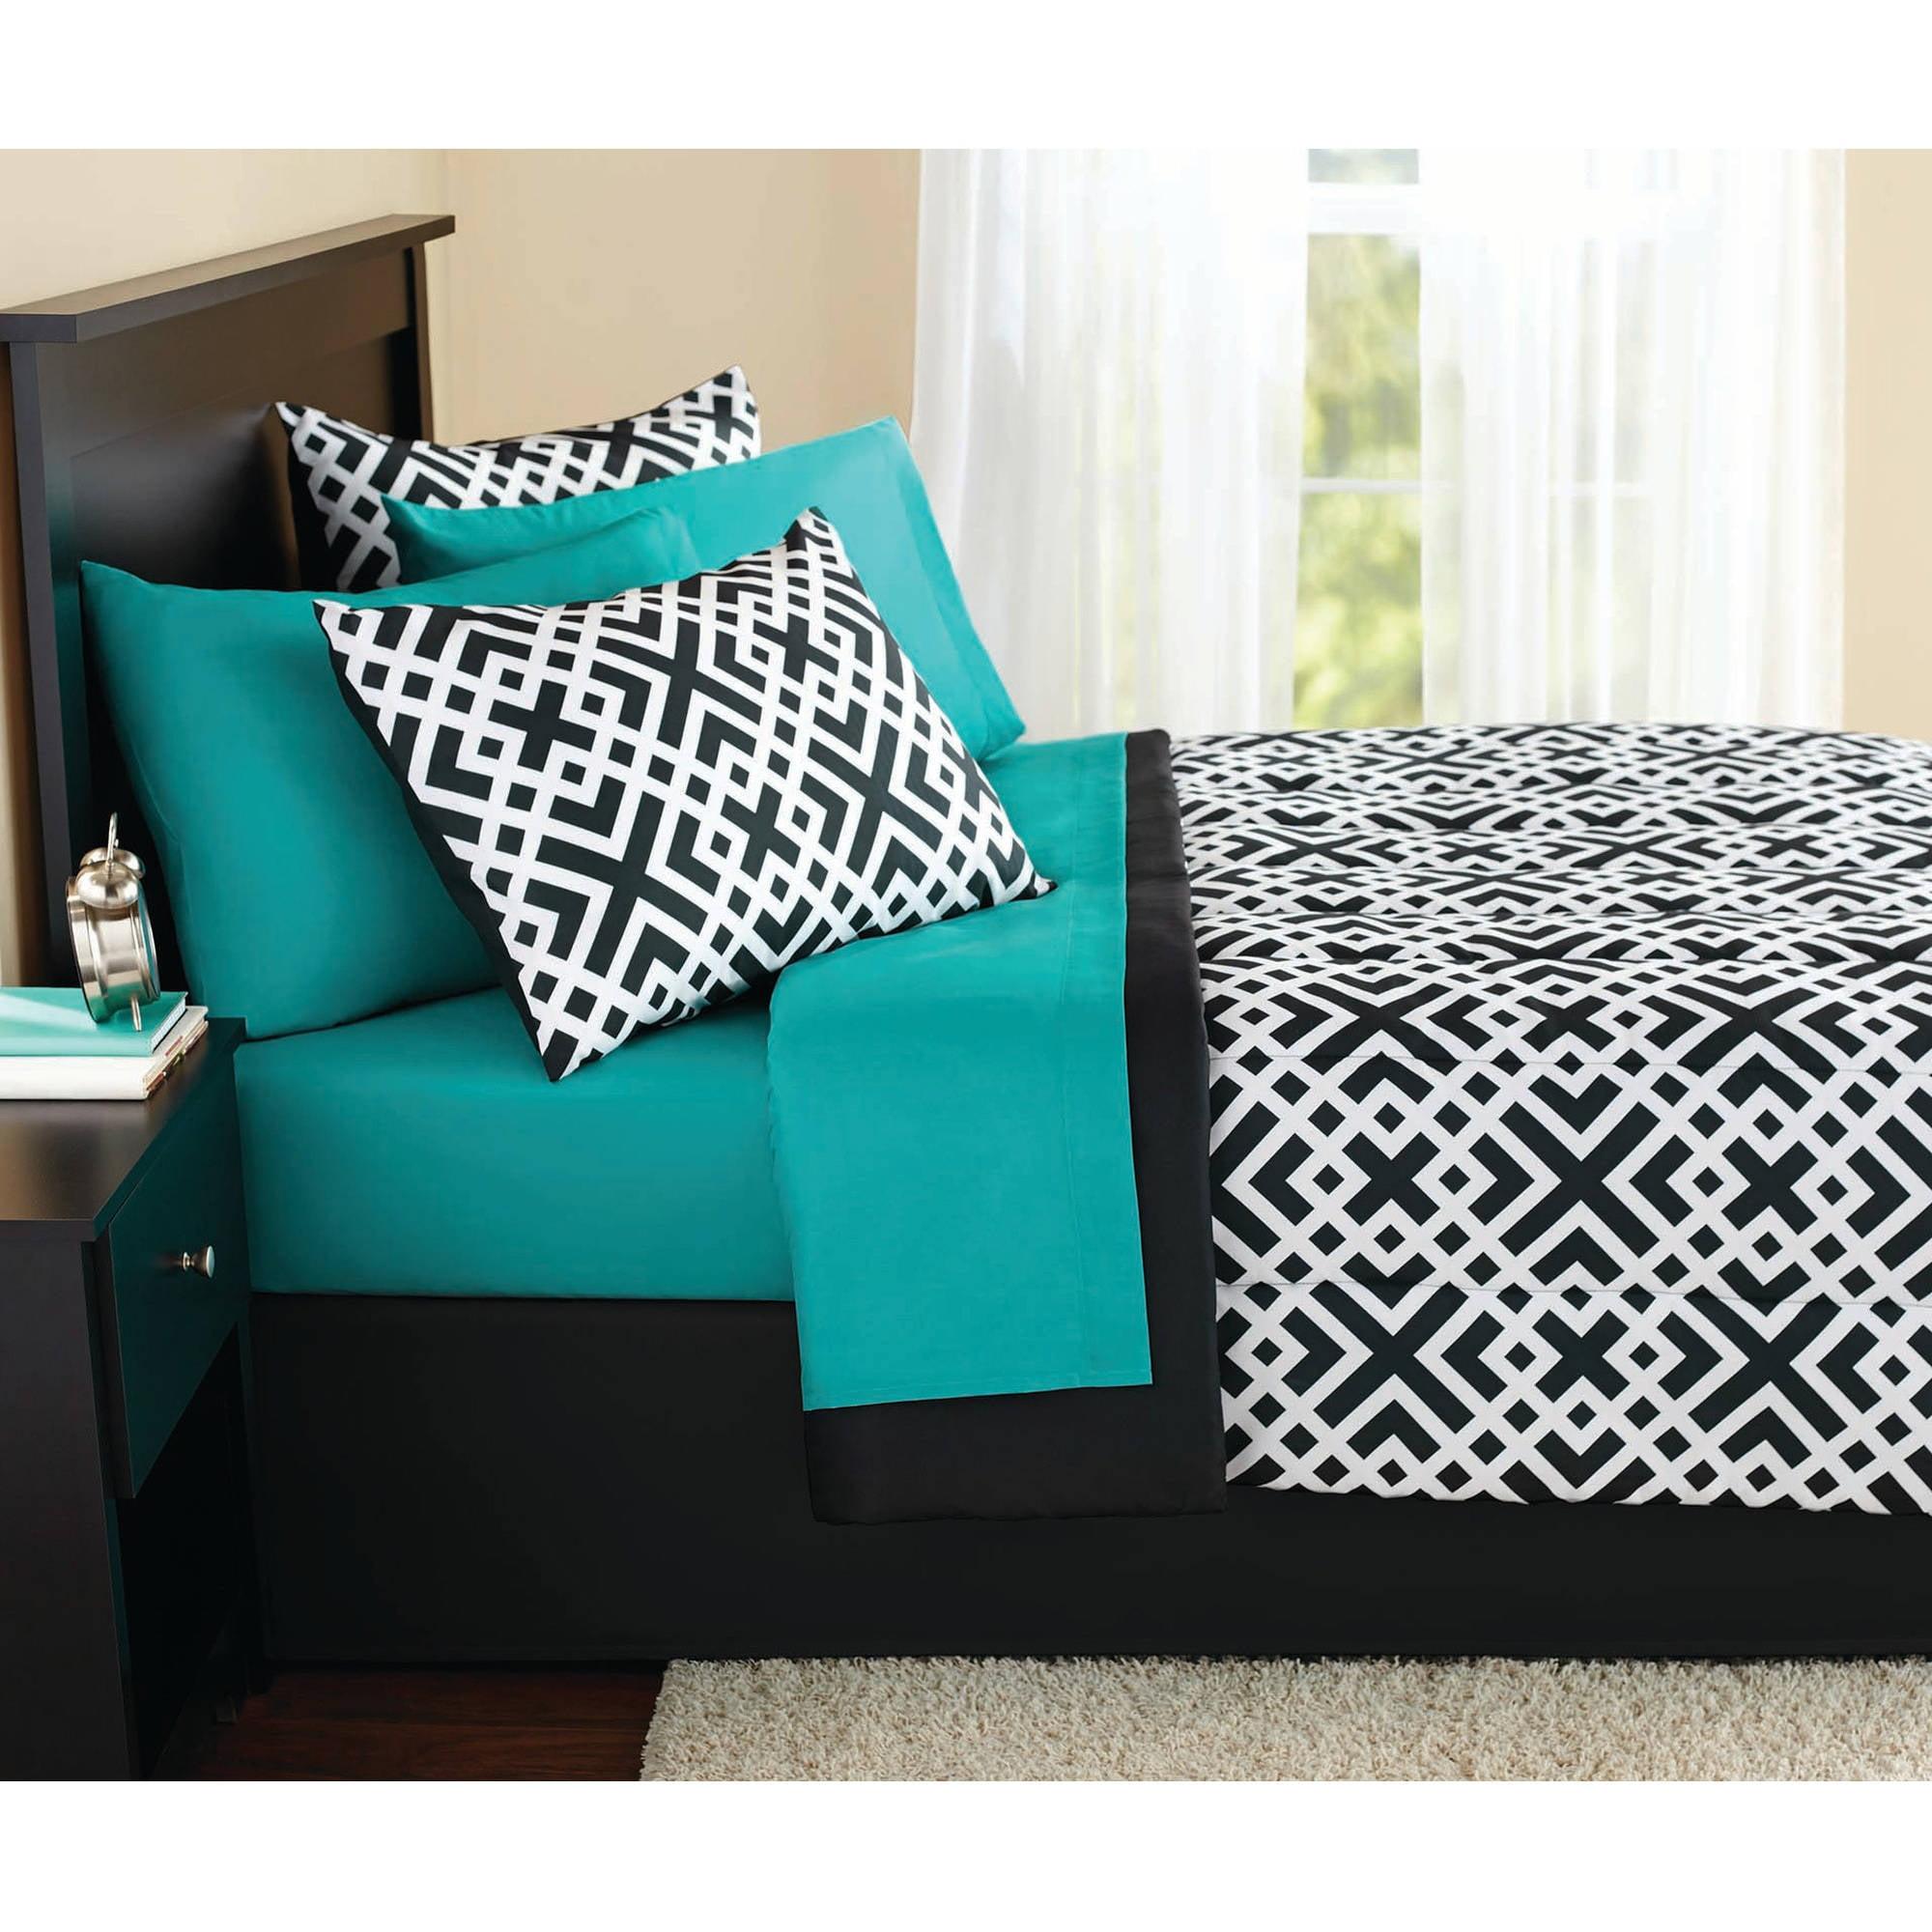 Mainstay Bedding Comforter Sets Walmart Com